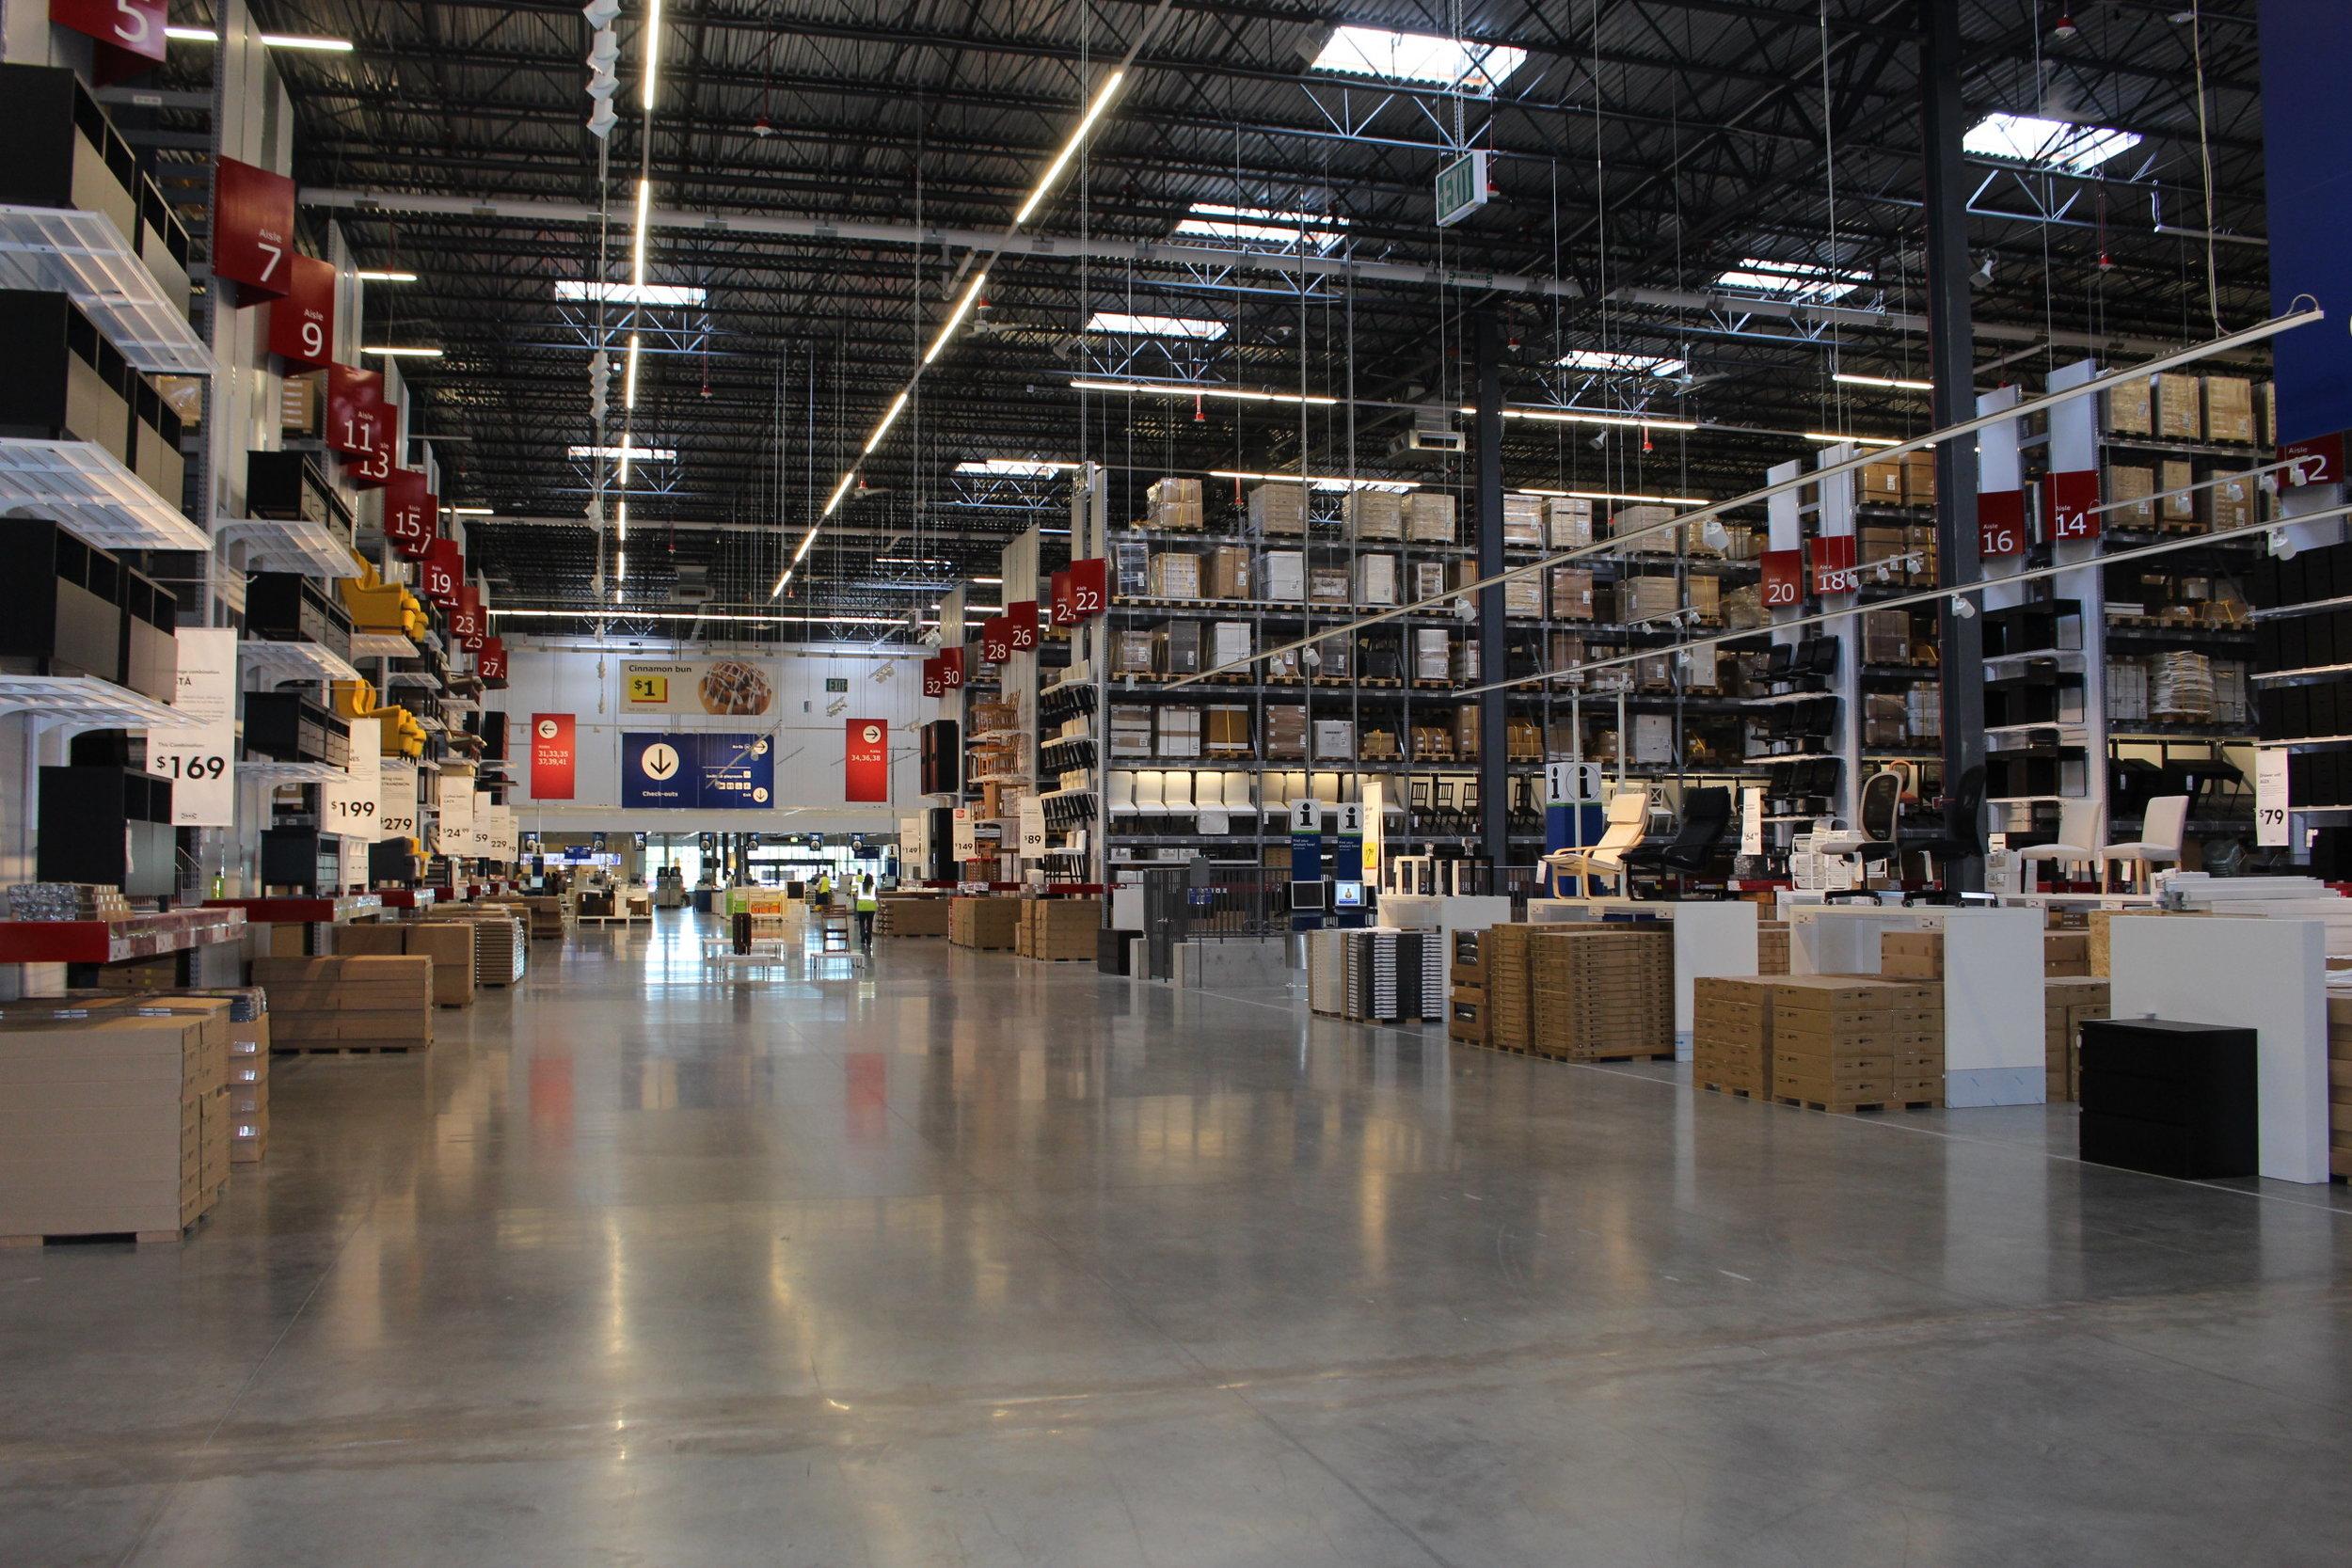 IKEA OPENS IN COLUMBUS -